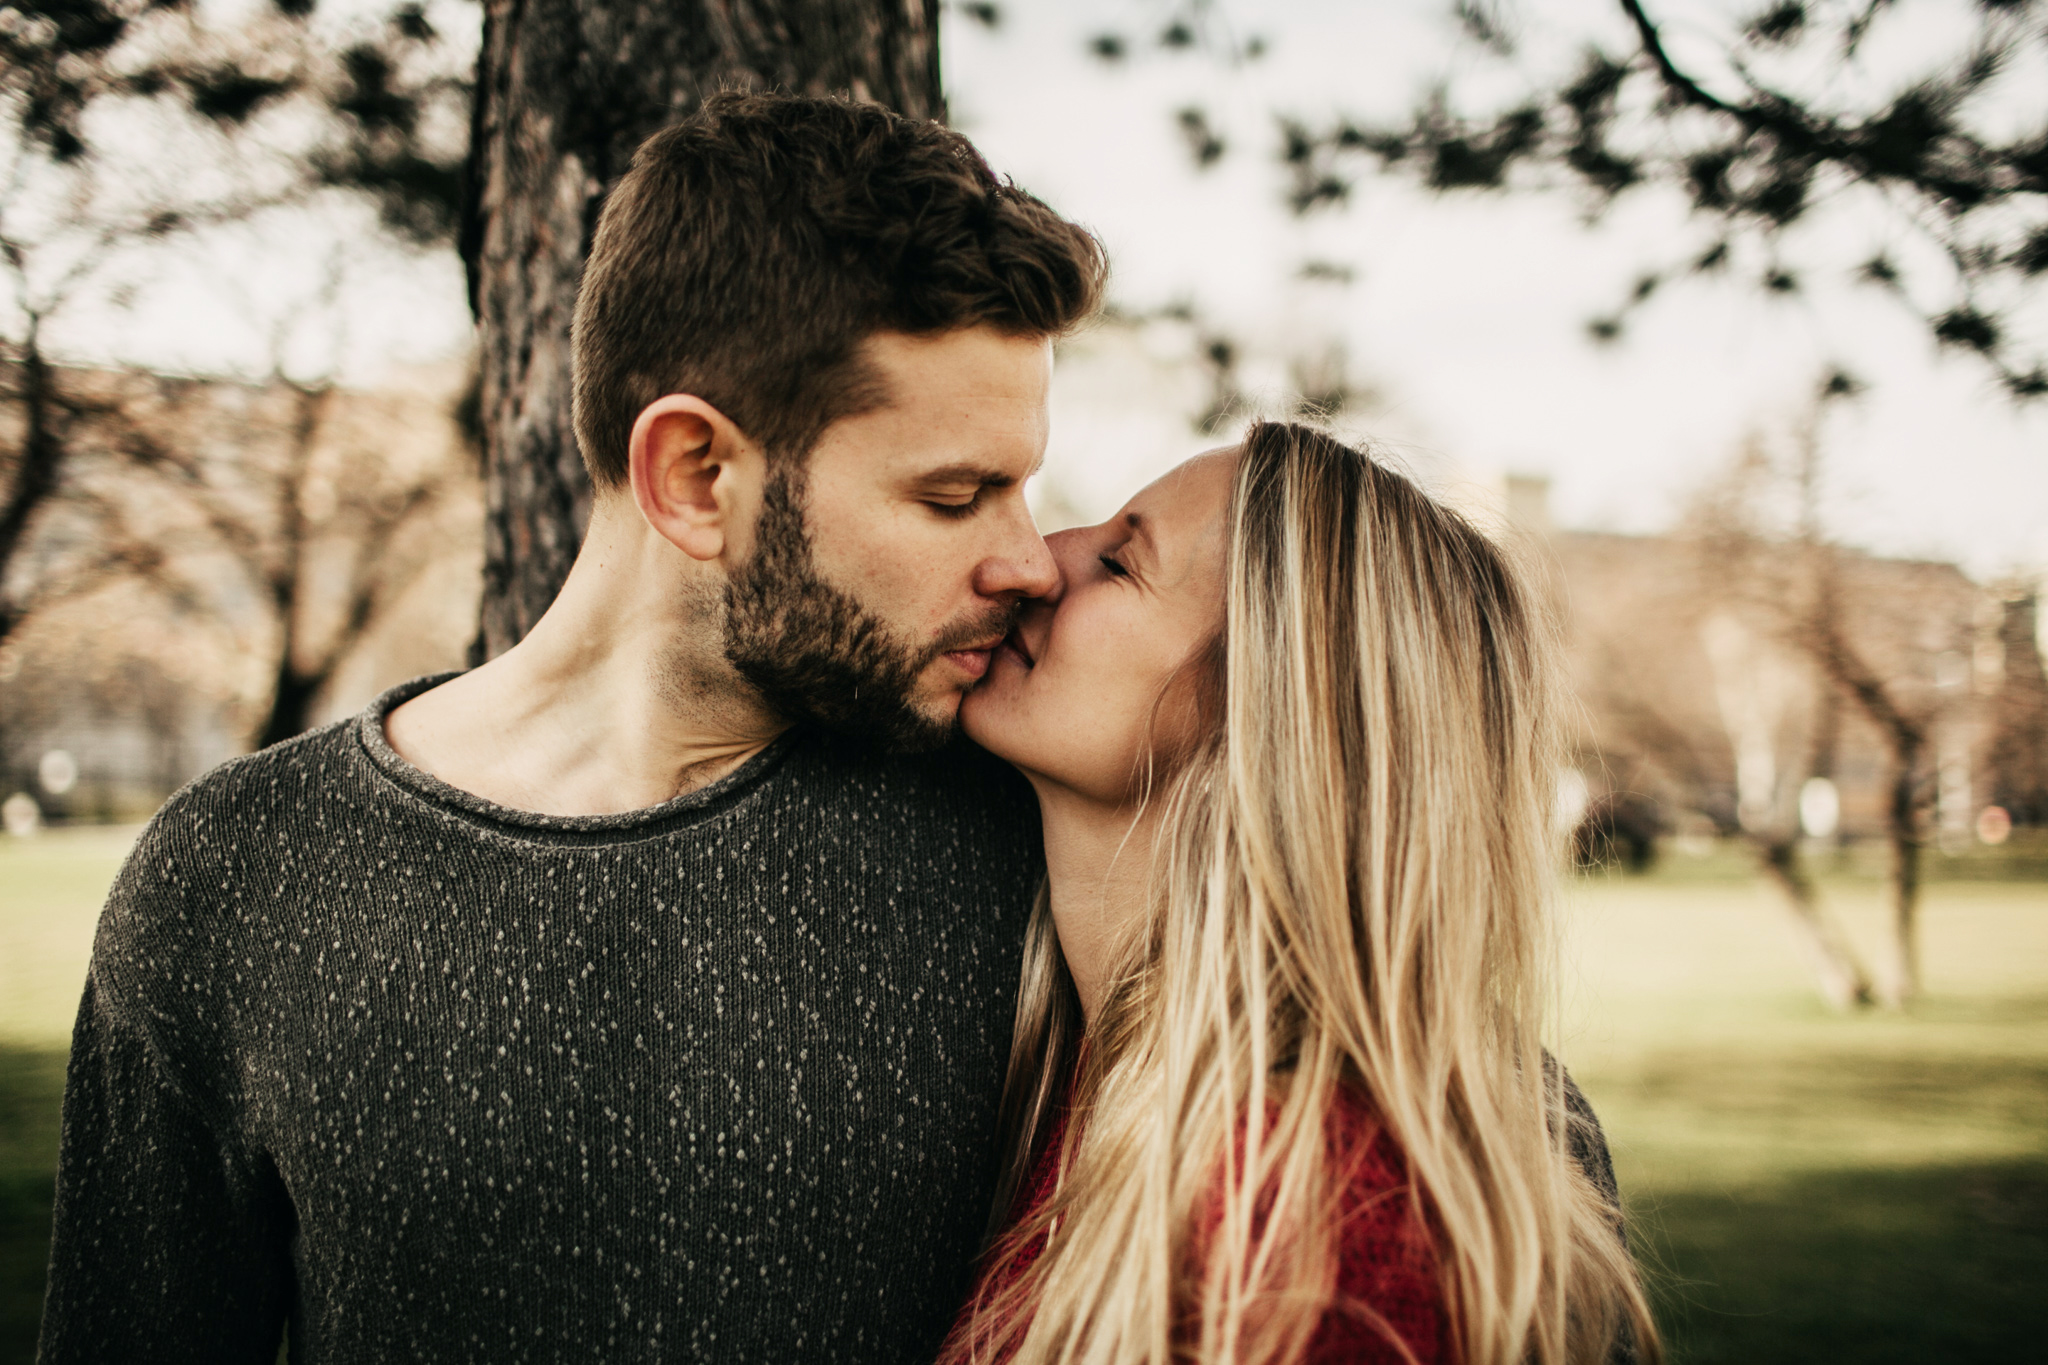 couple photoshoot in vienna - sarah longworth